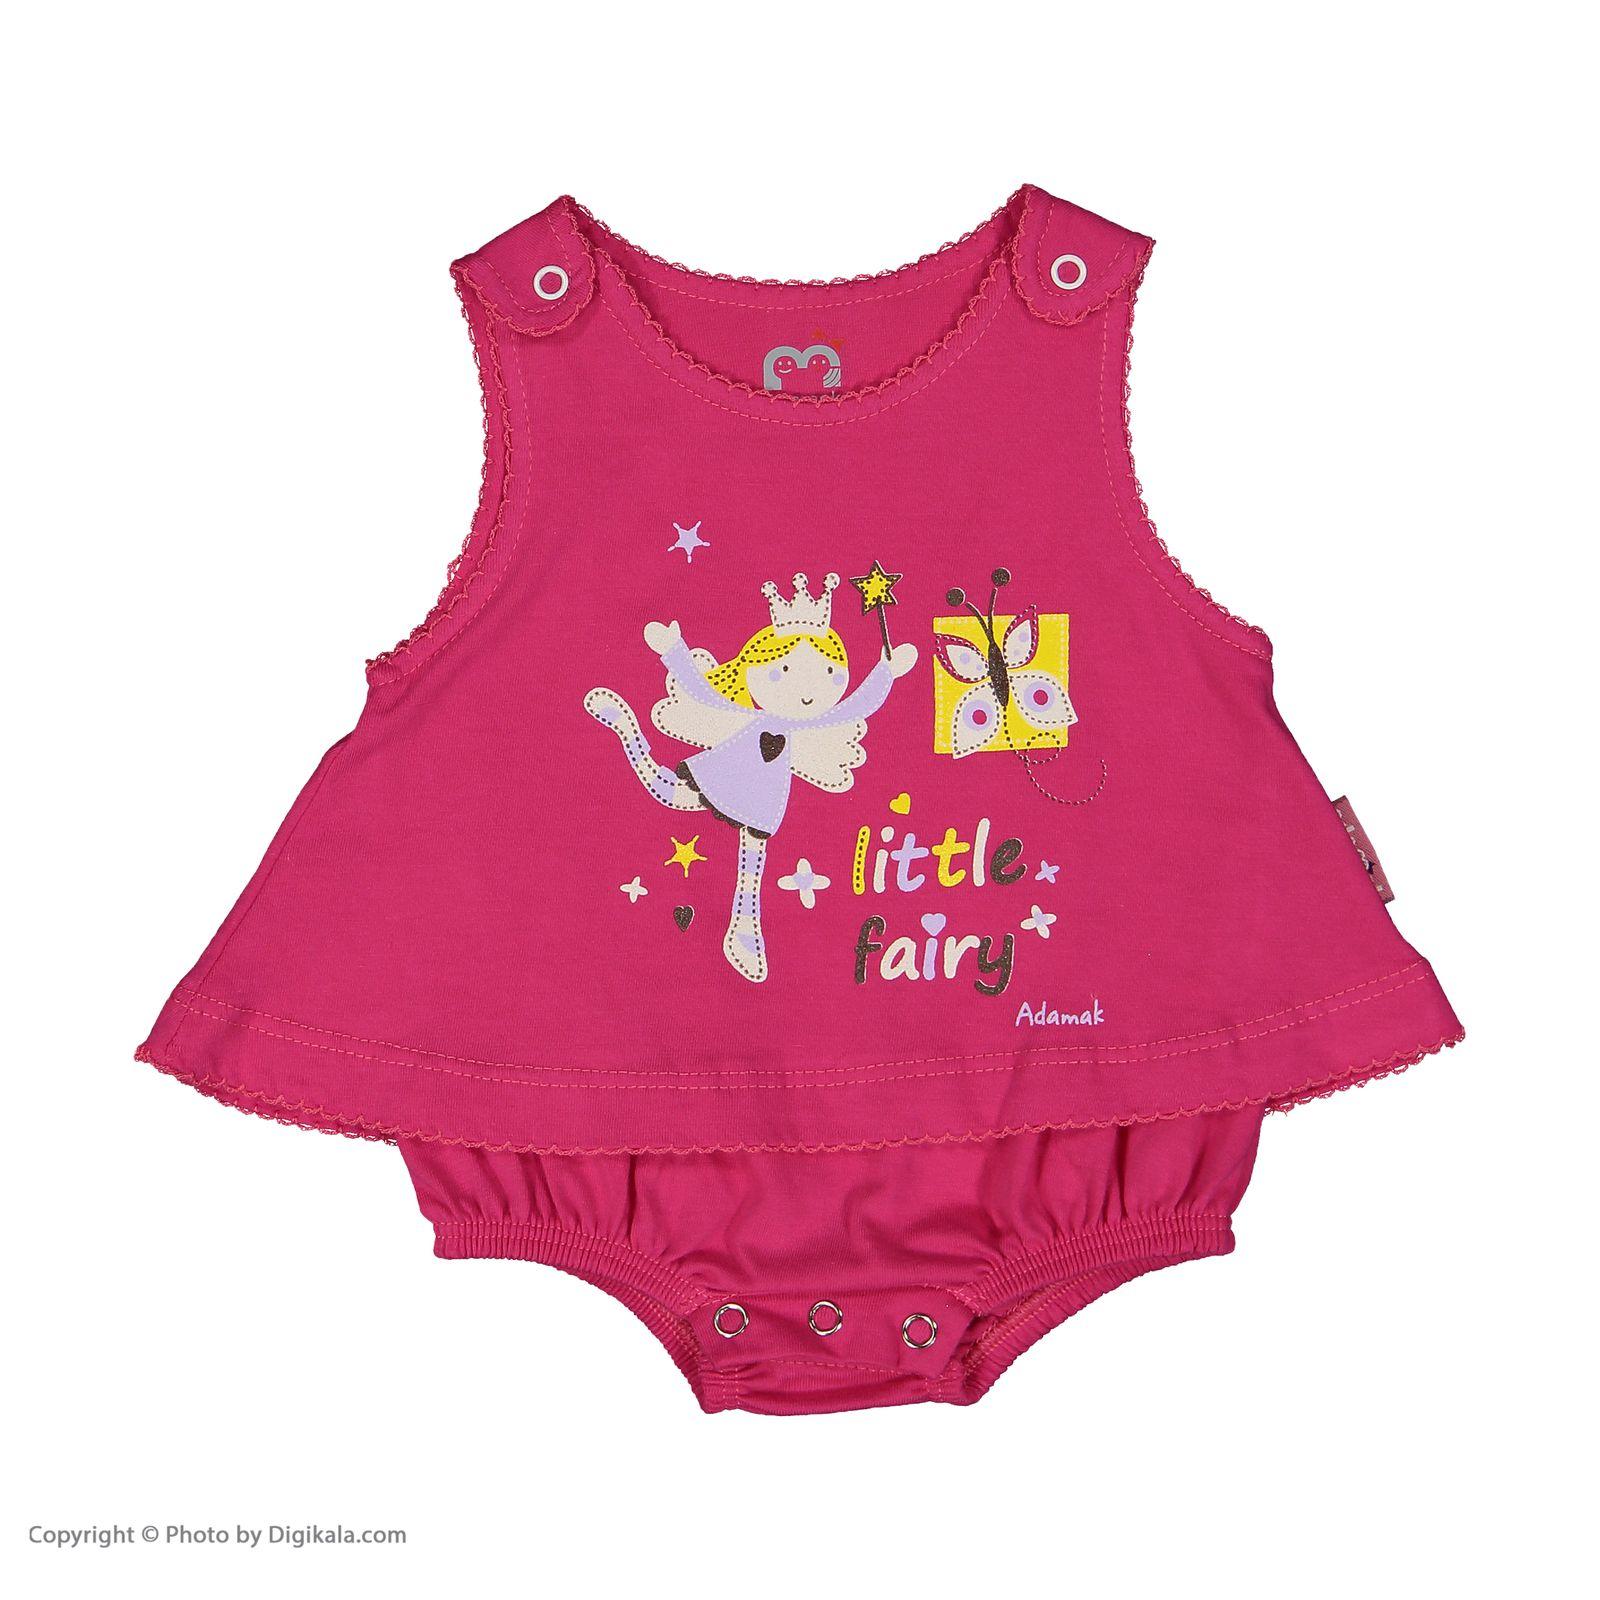 سرهمی نوزادی دخترانه آدمک مدل 2171108-88 -  - 4